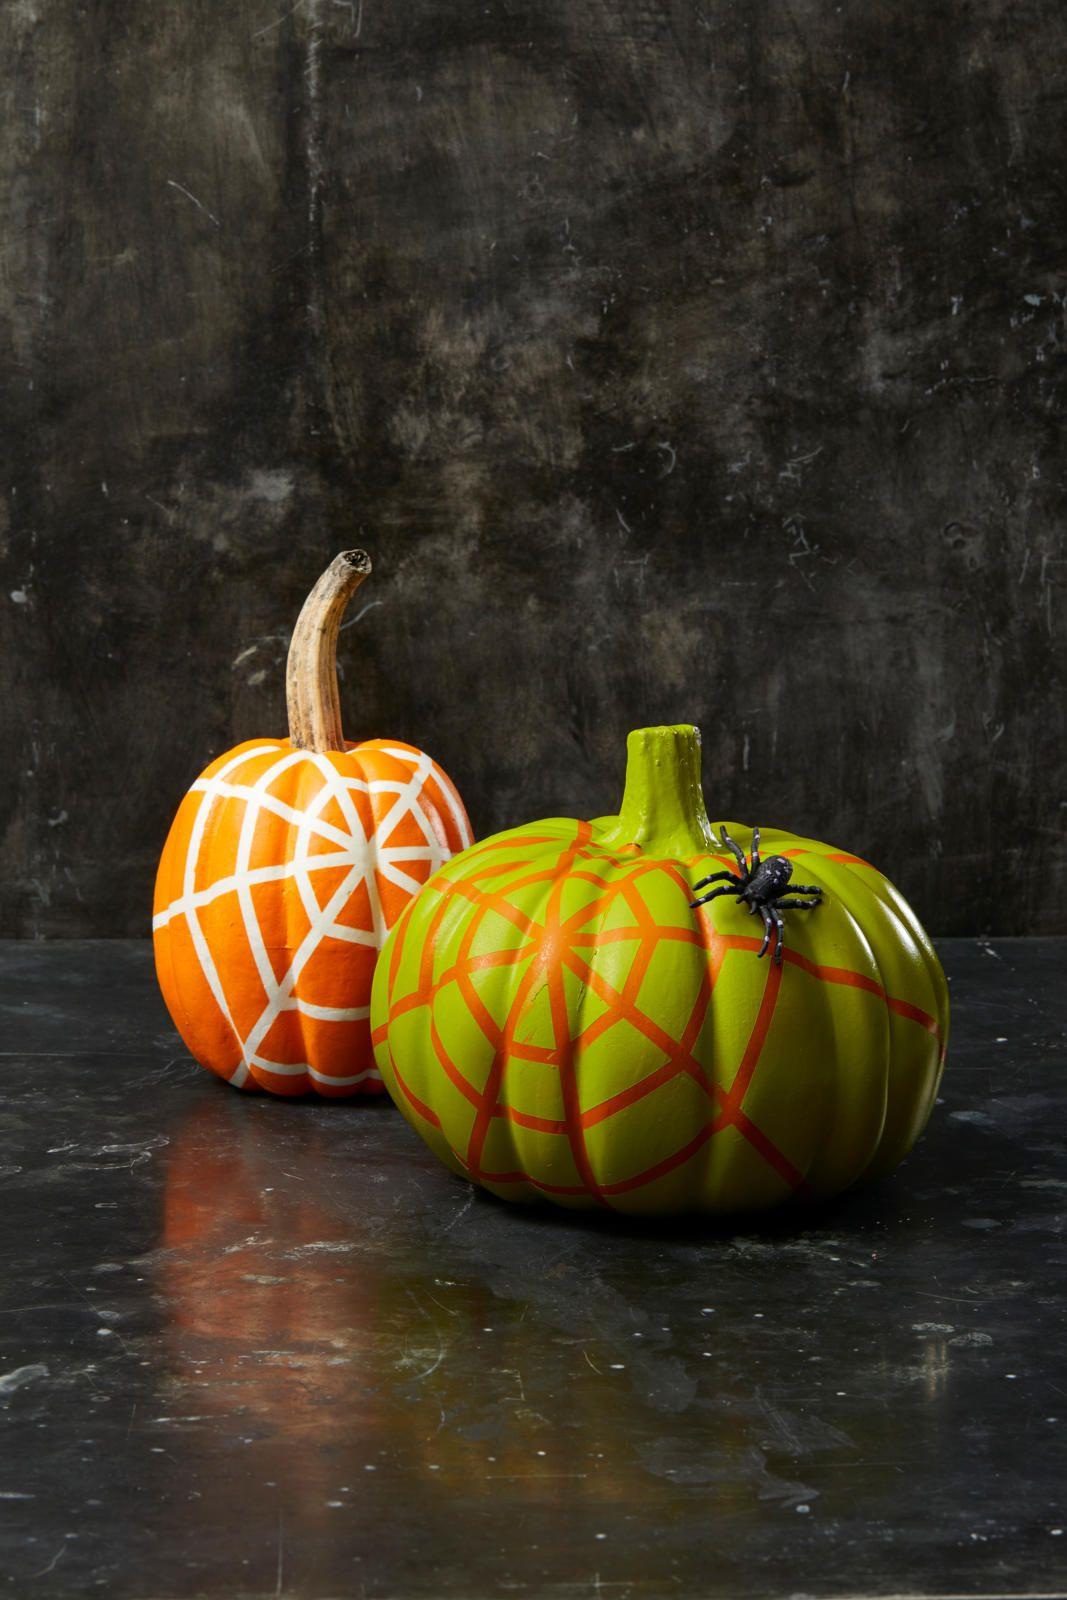 photograph regarding Peanuts Pumpkin Printable Carving Patterns named 30+ Pumpkin Portray Designs - Painted Pumpkins for Halloween 2018